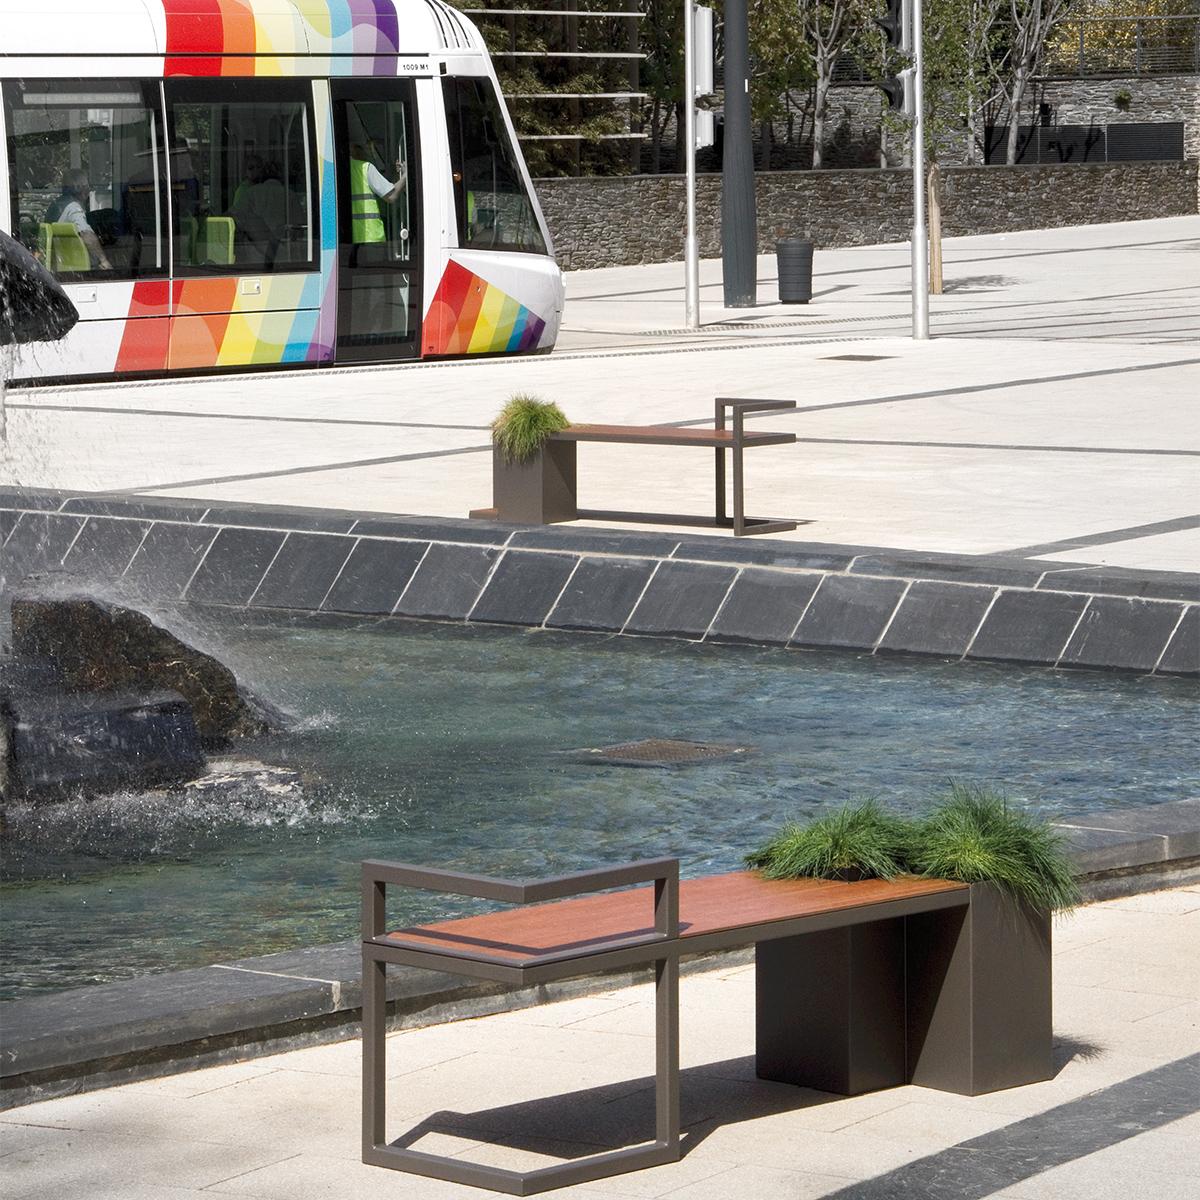 ATECH-eco-district-design-city-hedera-range